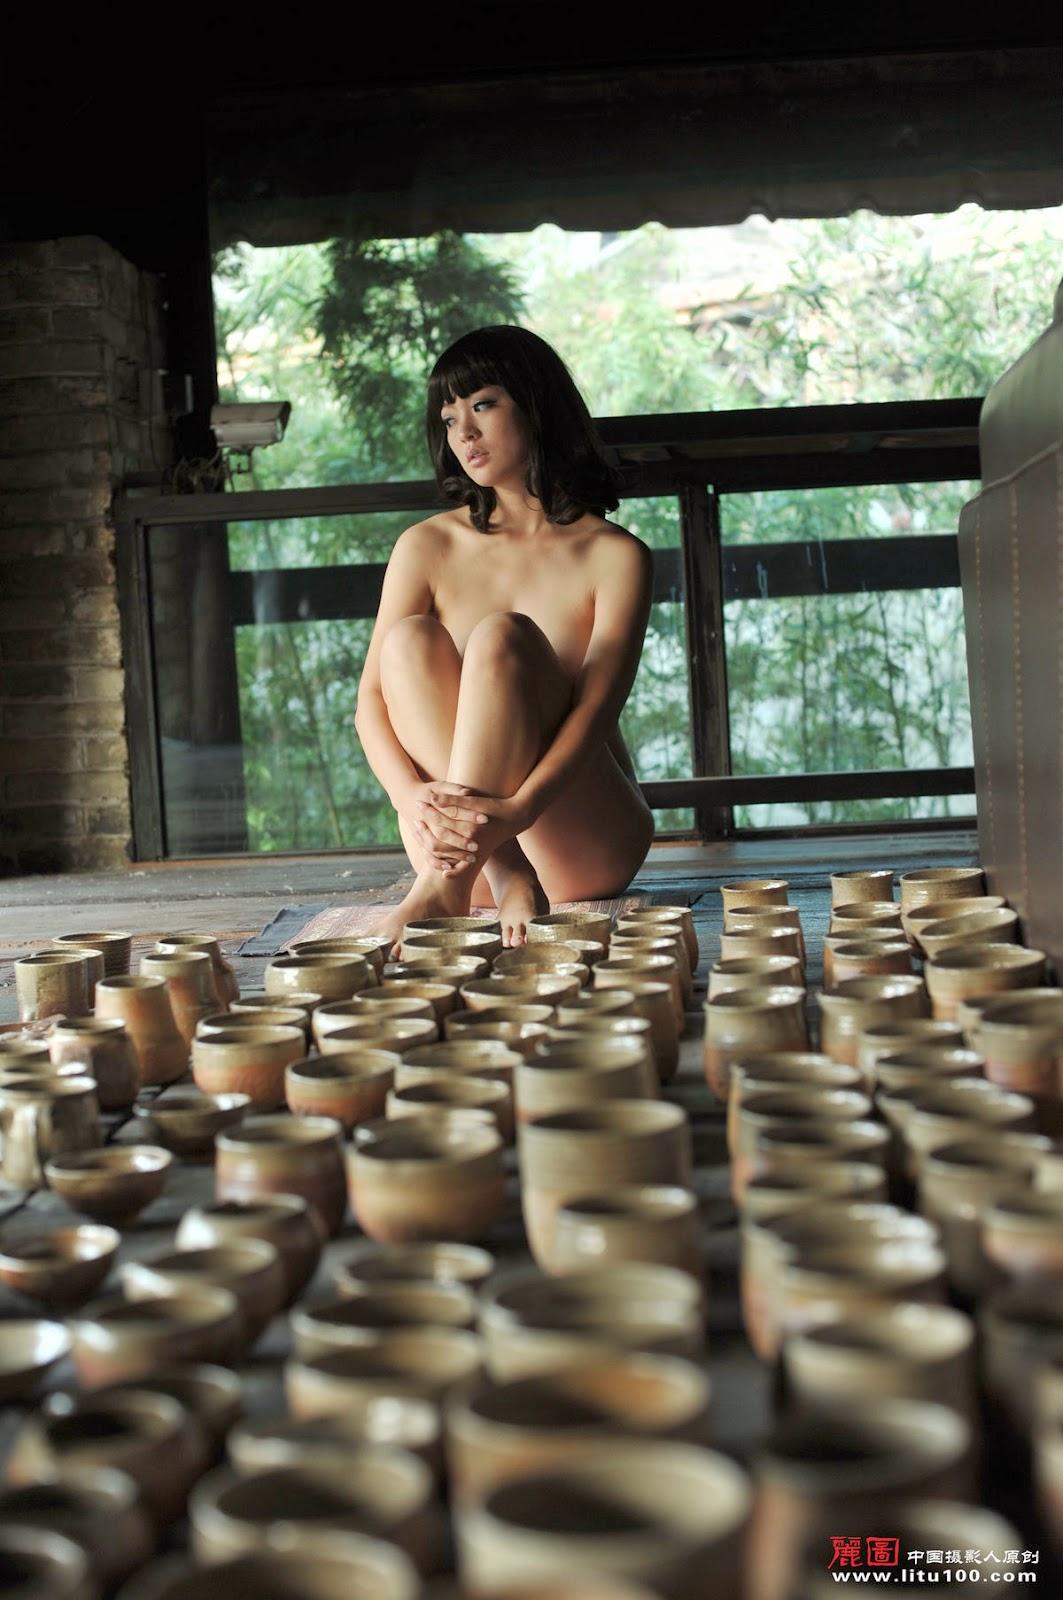 DSC 7171 - Chinese Nude Model Su Quan [Litu100]   18+ gallery photos